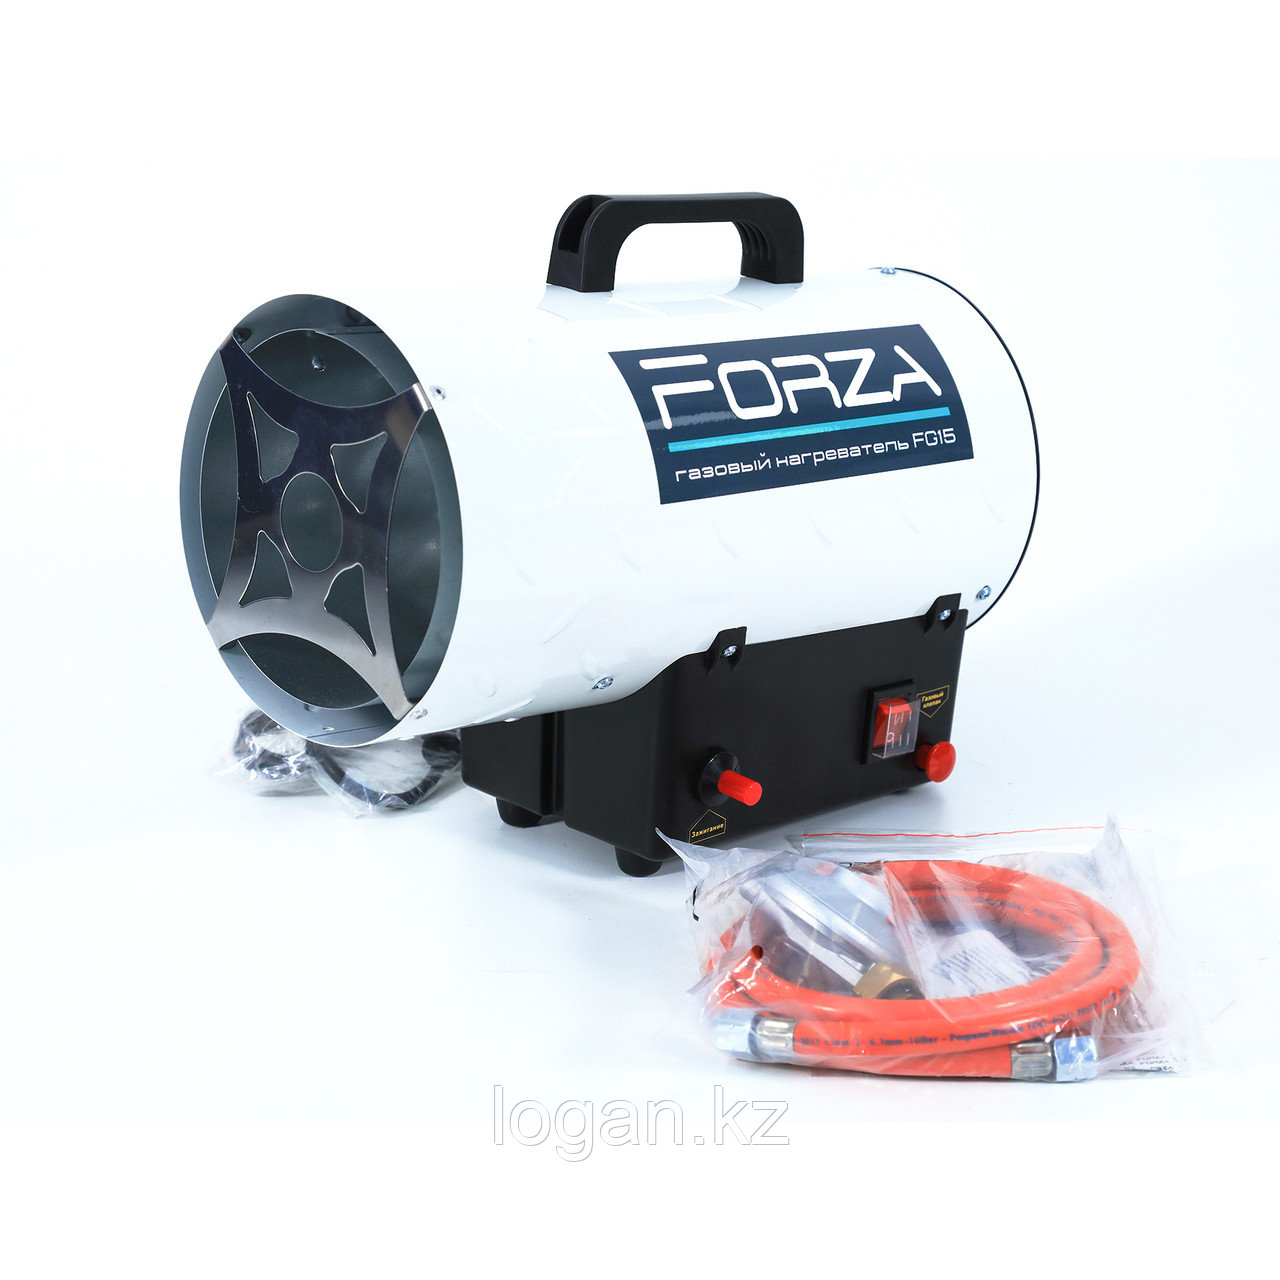 Тепловая пушка газовая Forza FG15